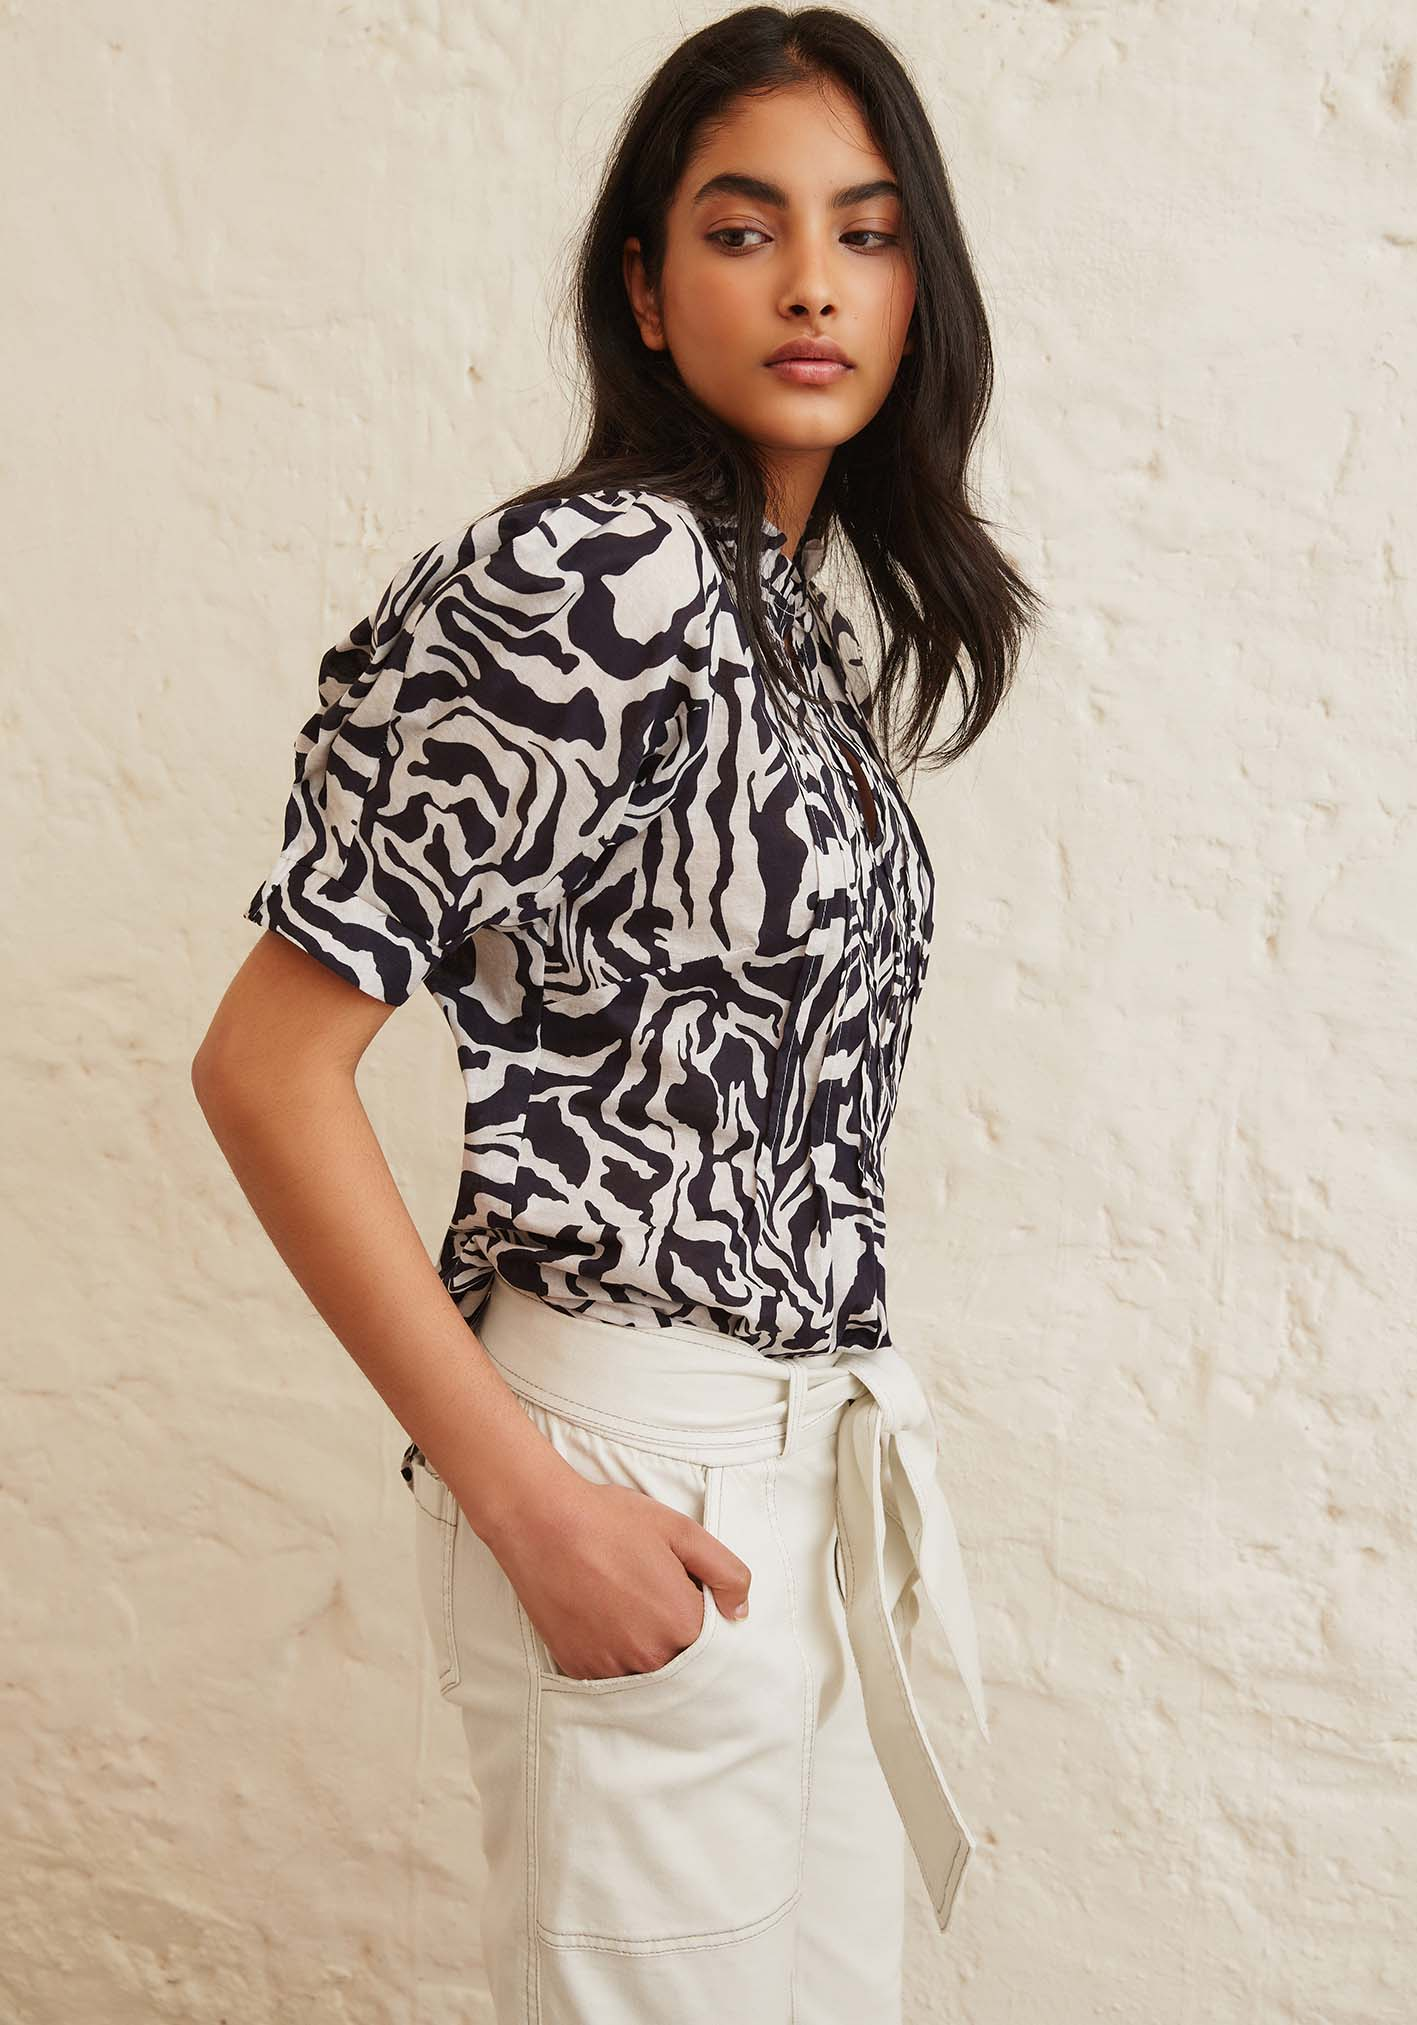 Sally Phillips - Adelaide Fashion Designer - S | S 1 9